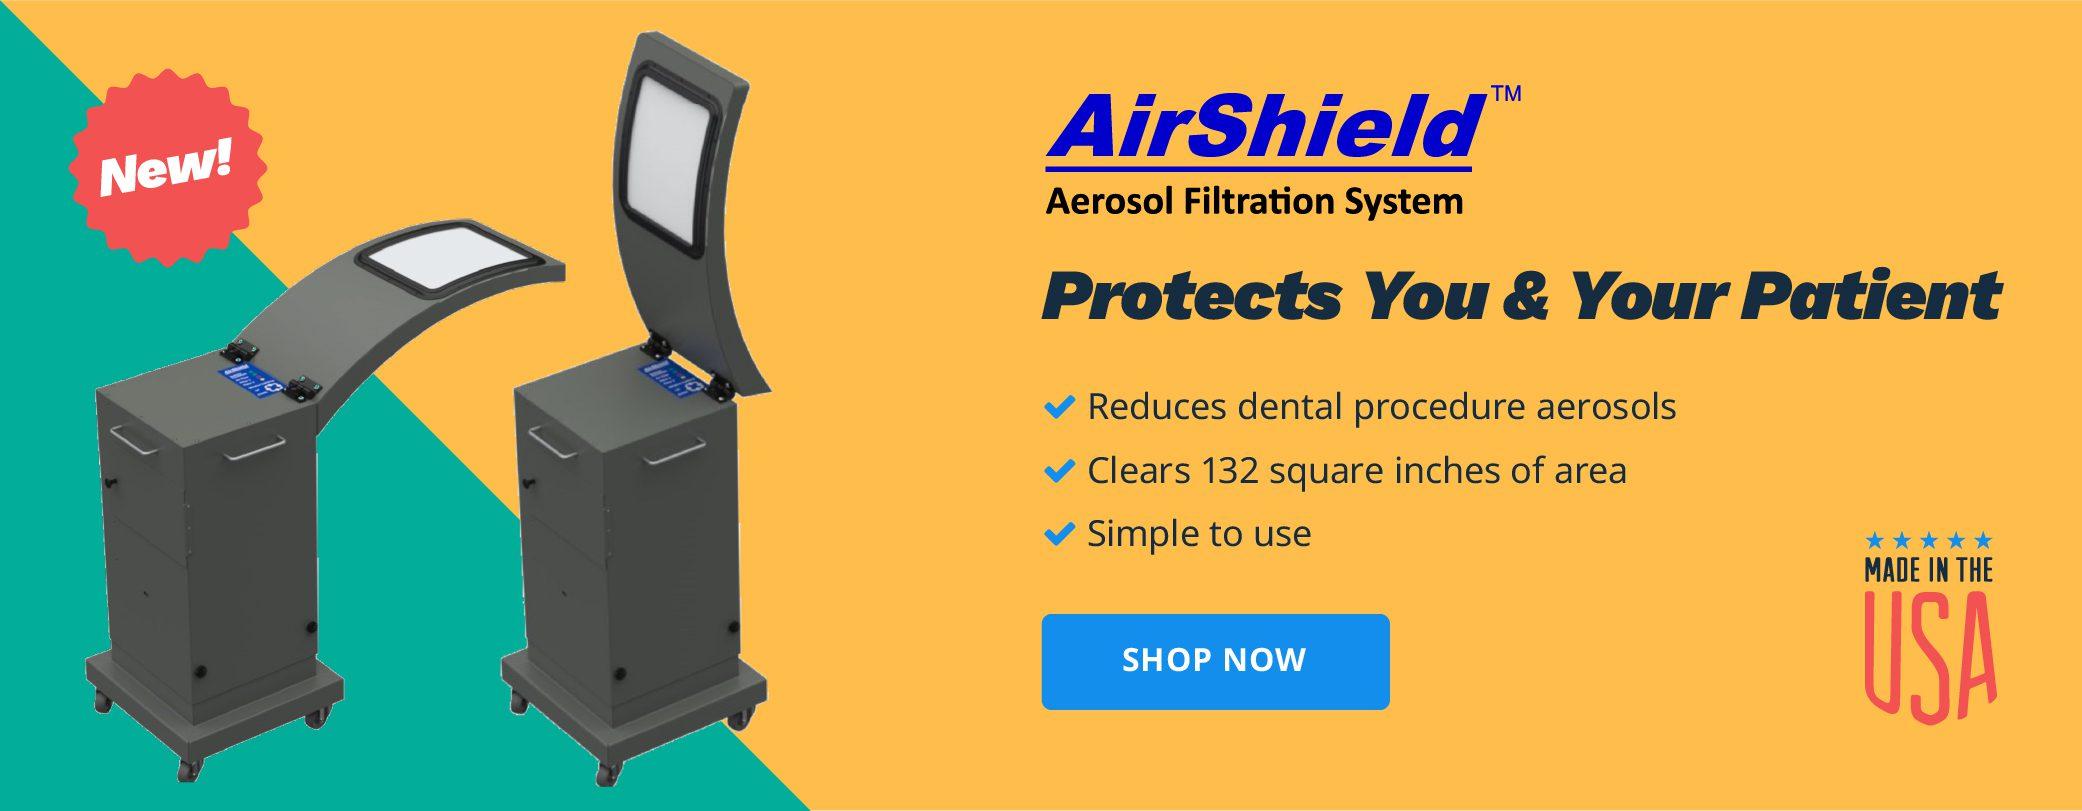 AirShield Aerosol Filtration Systems | Shop Now